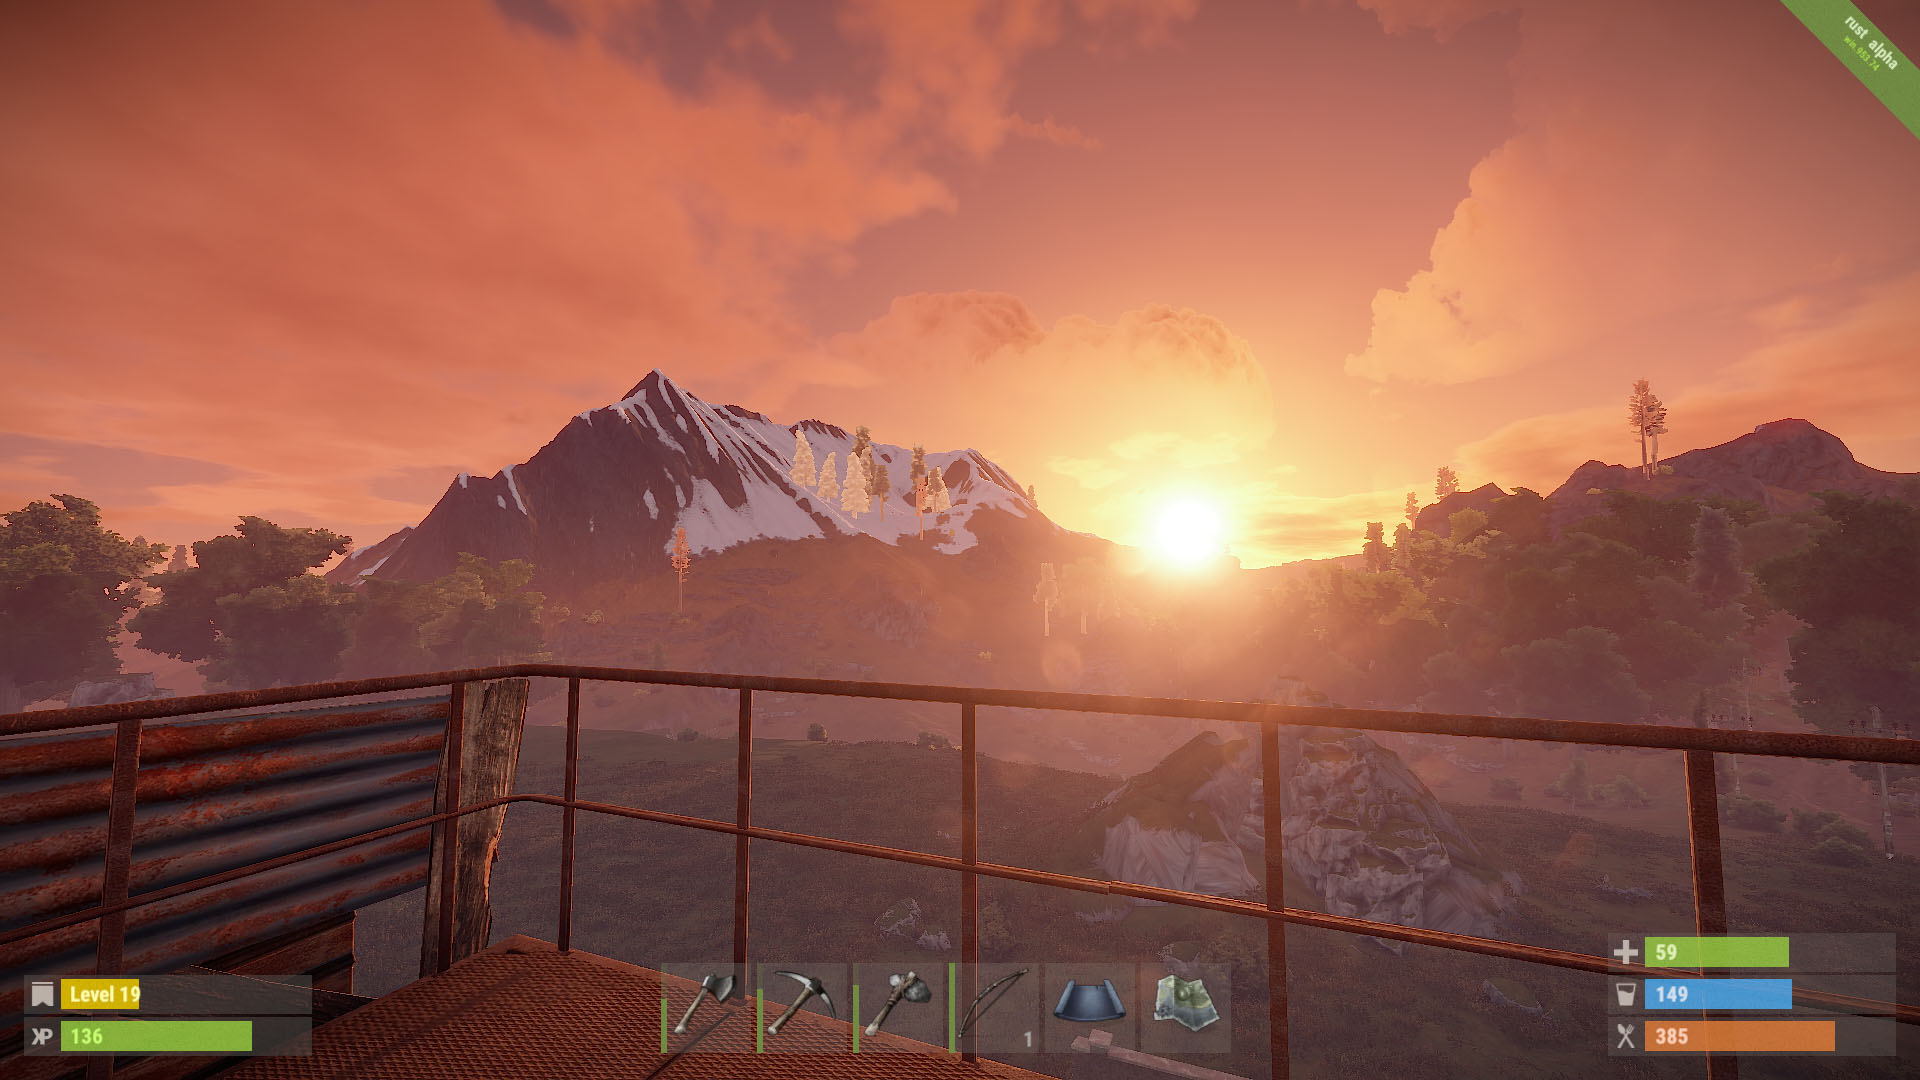 Horizon screenshot in Rust